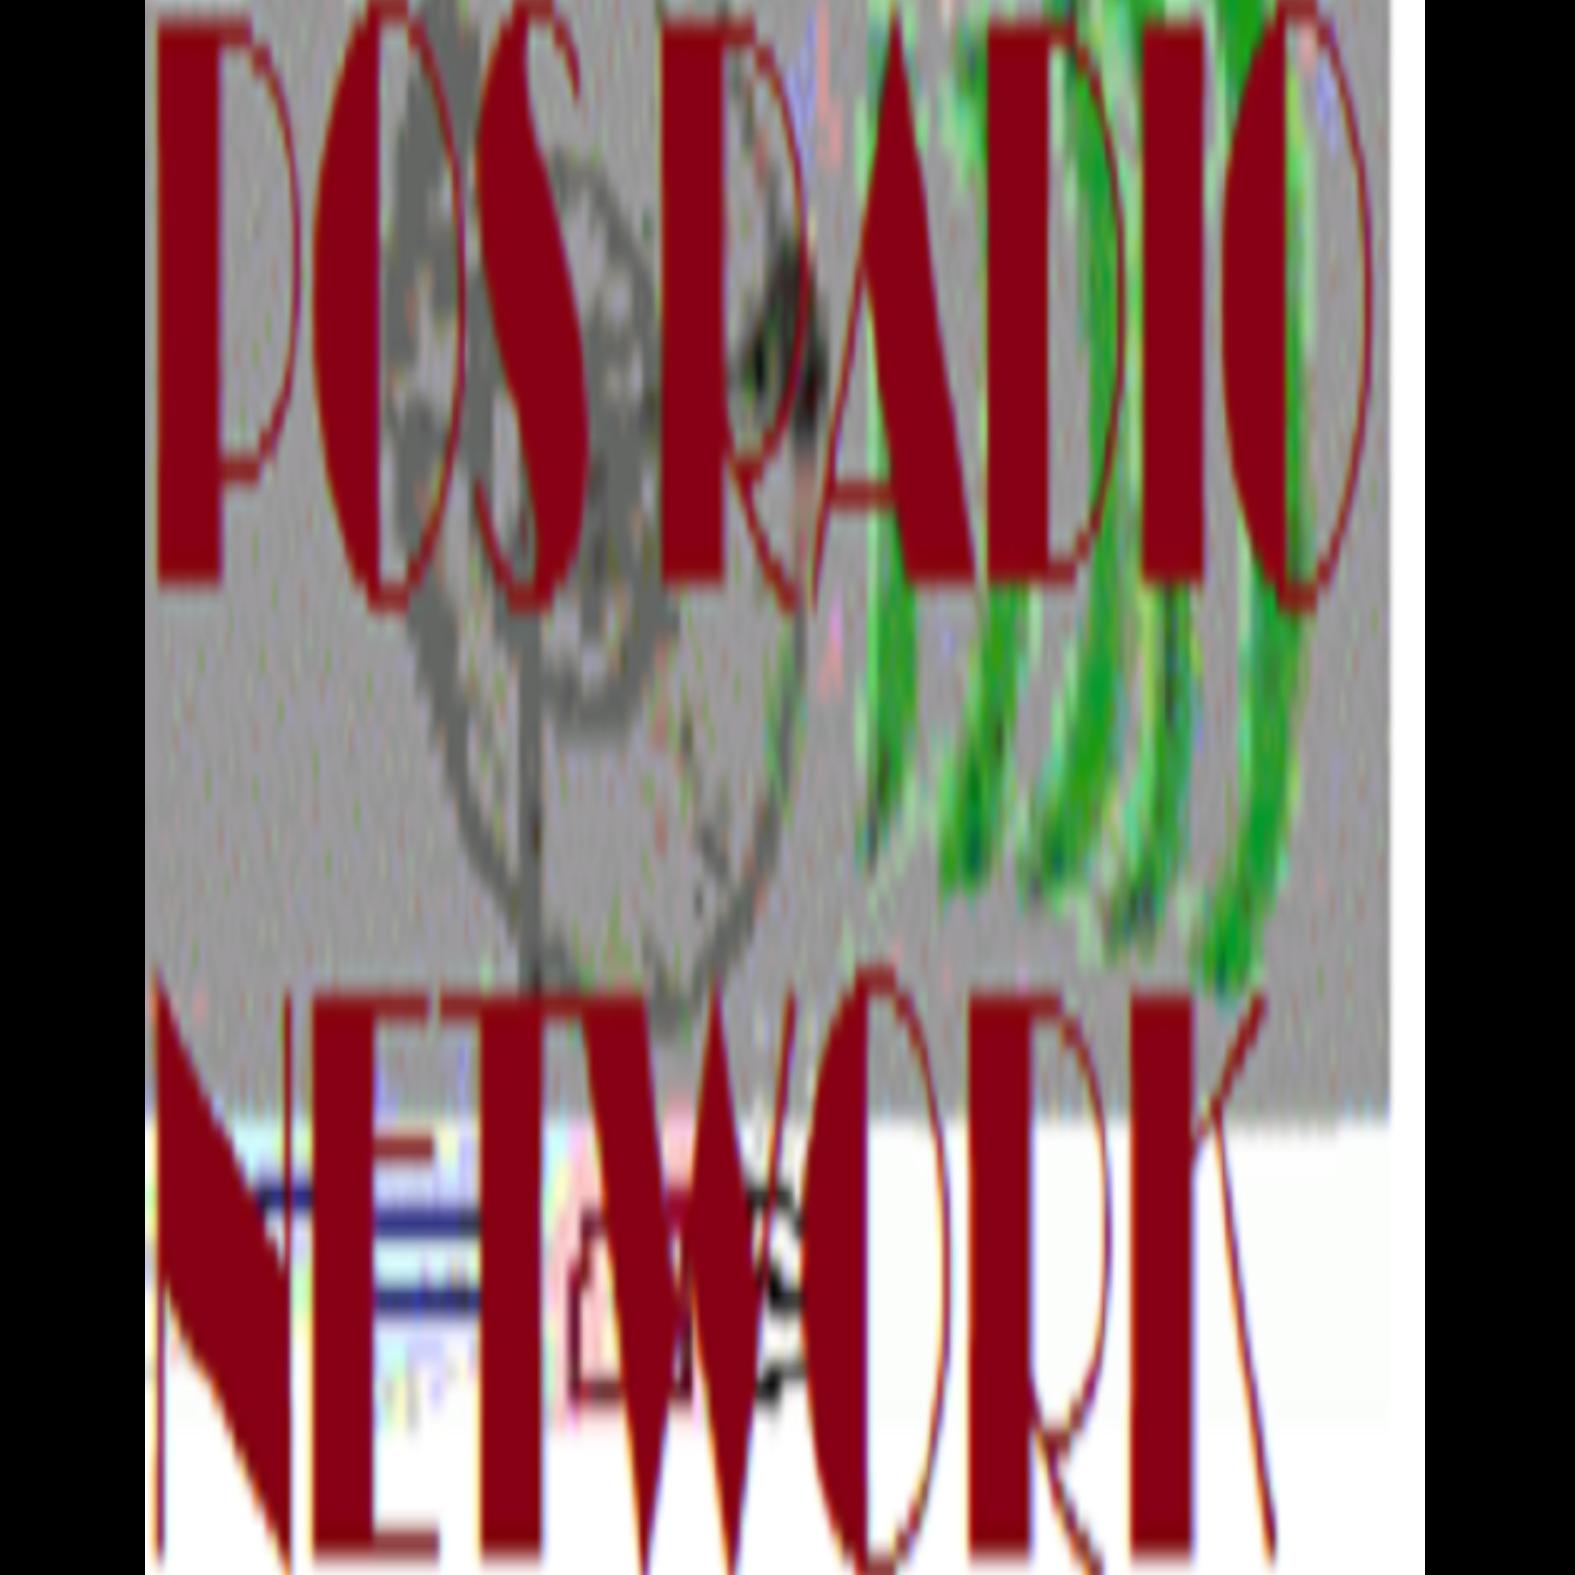 POS RADIO NETWORK